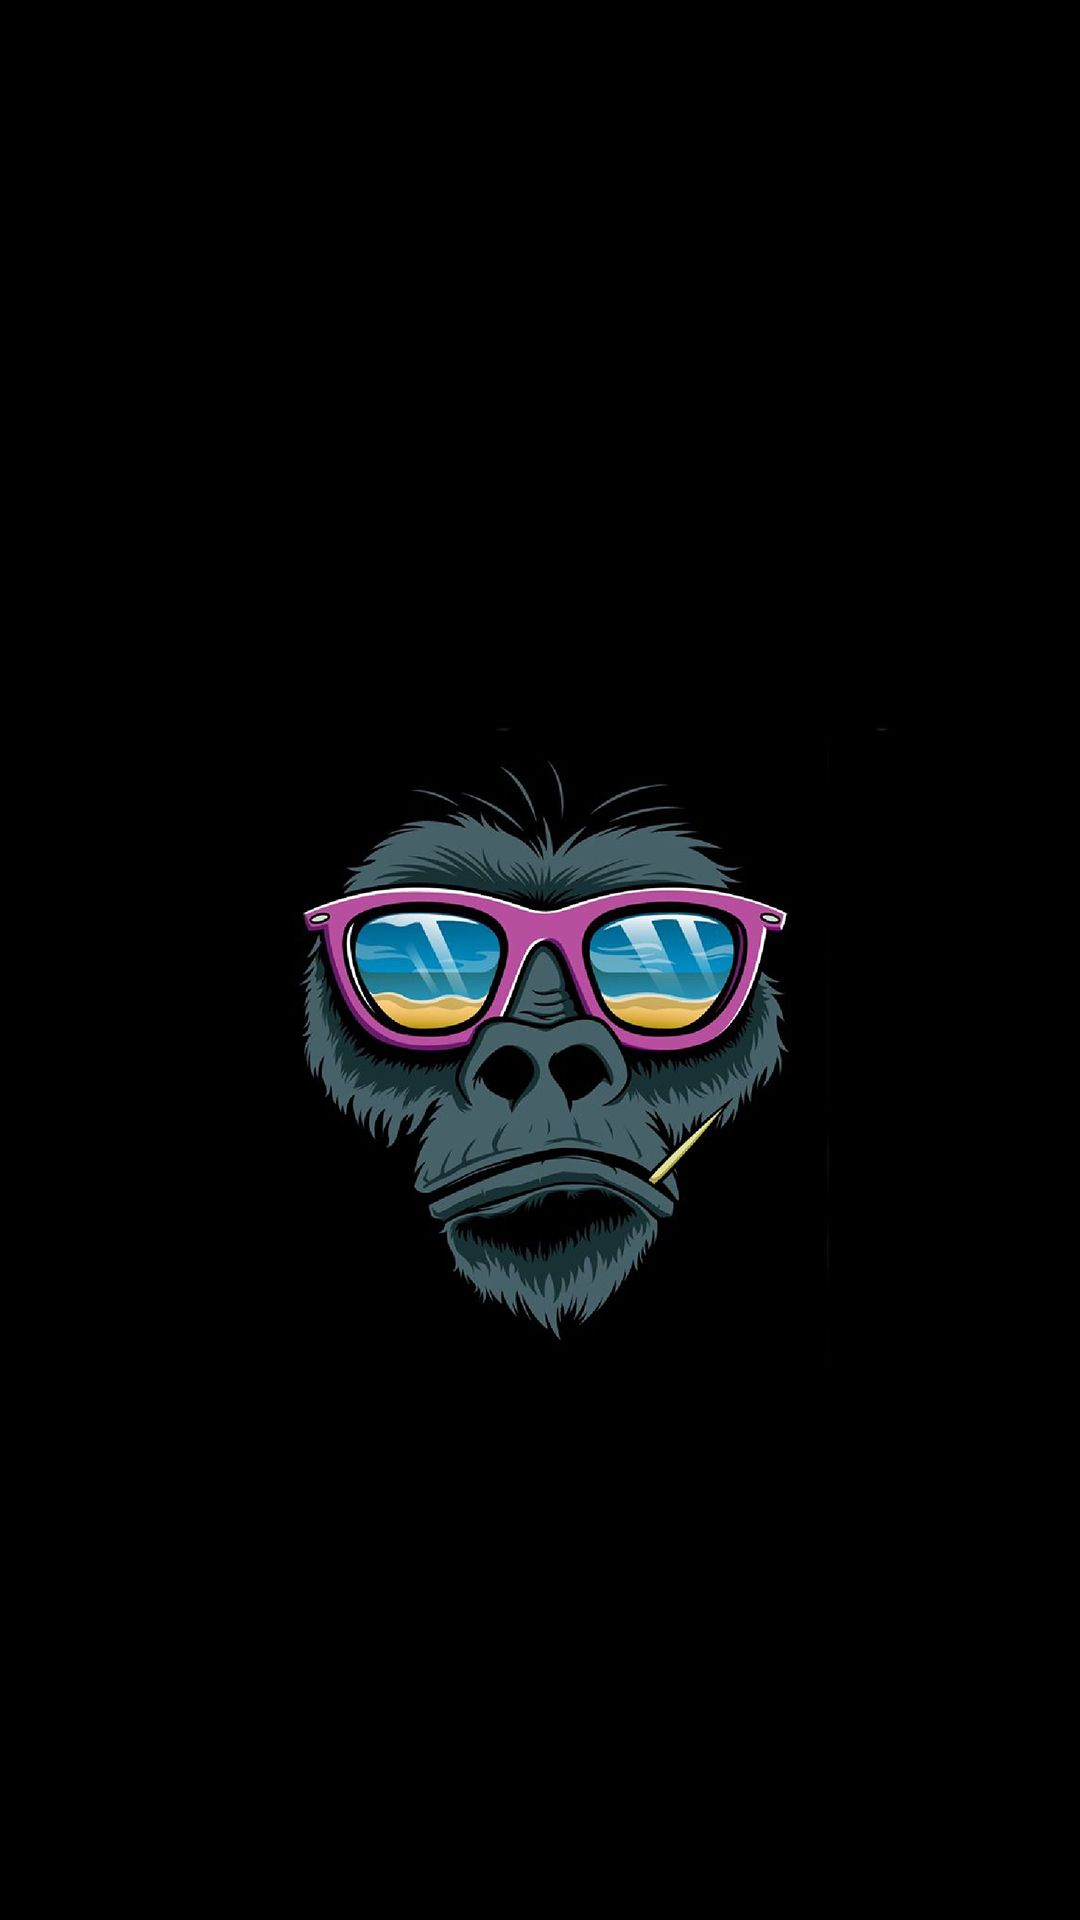 Monkey #iPhone #iPad #wallpaper | iPhone wallpapers... | Art, Monkey art, Pop art